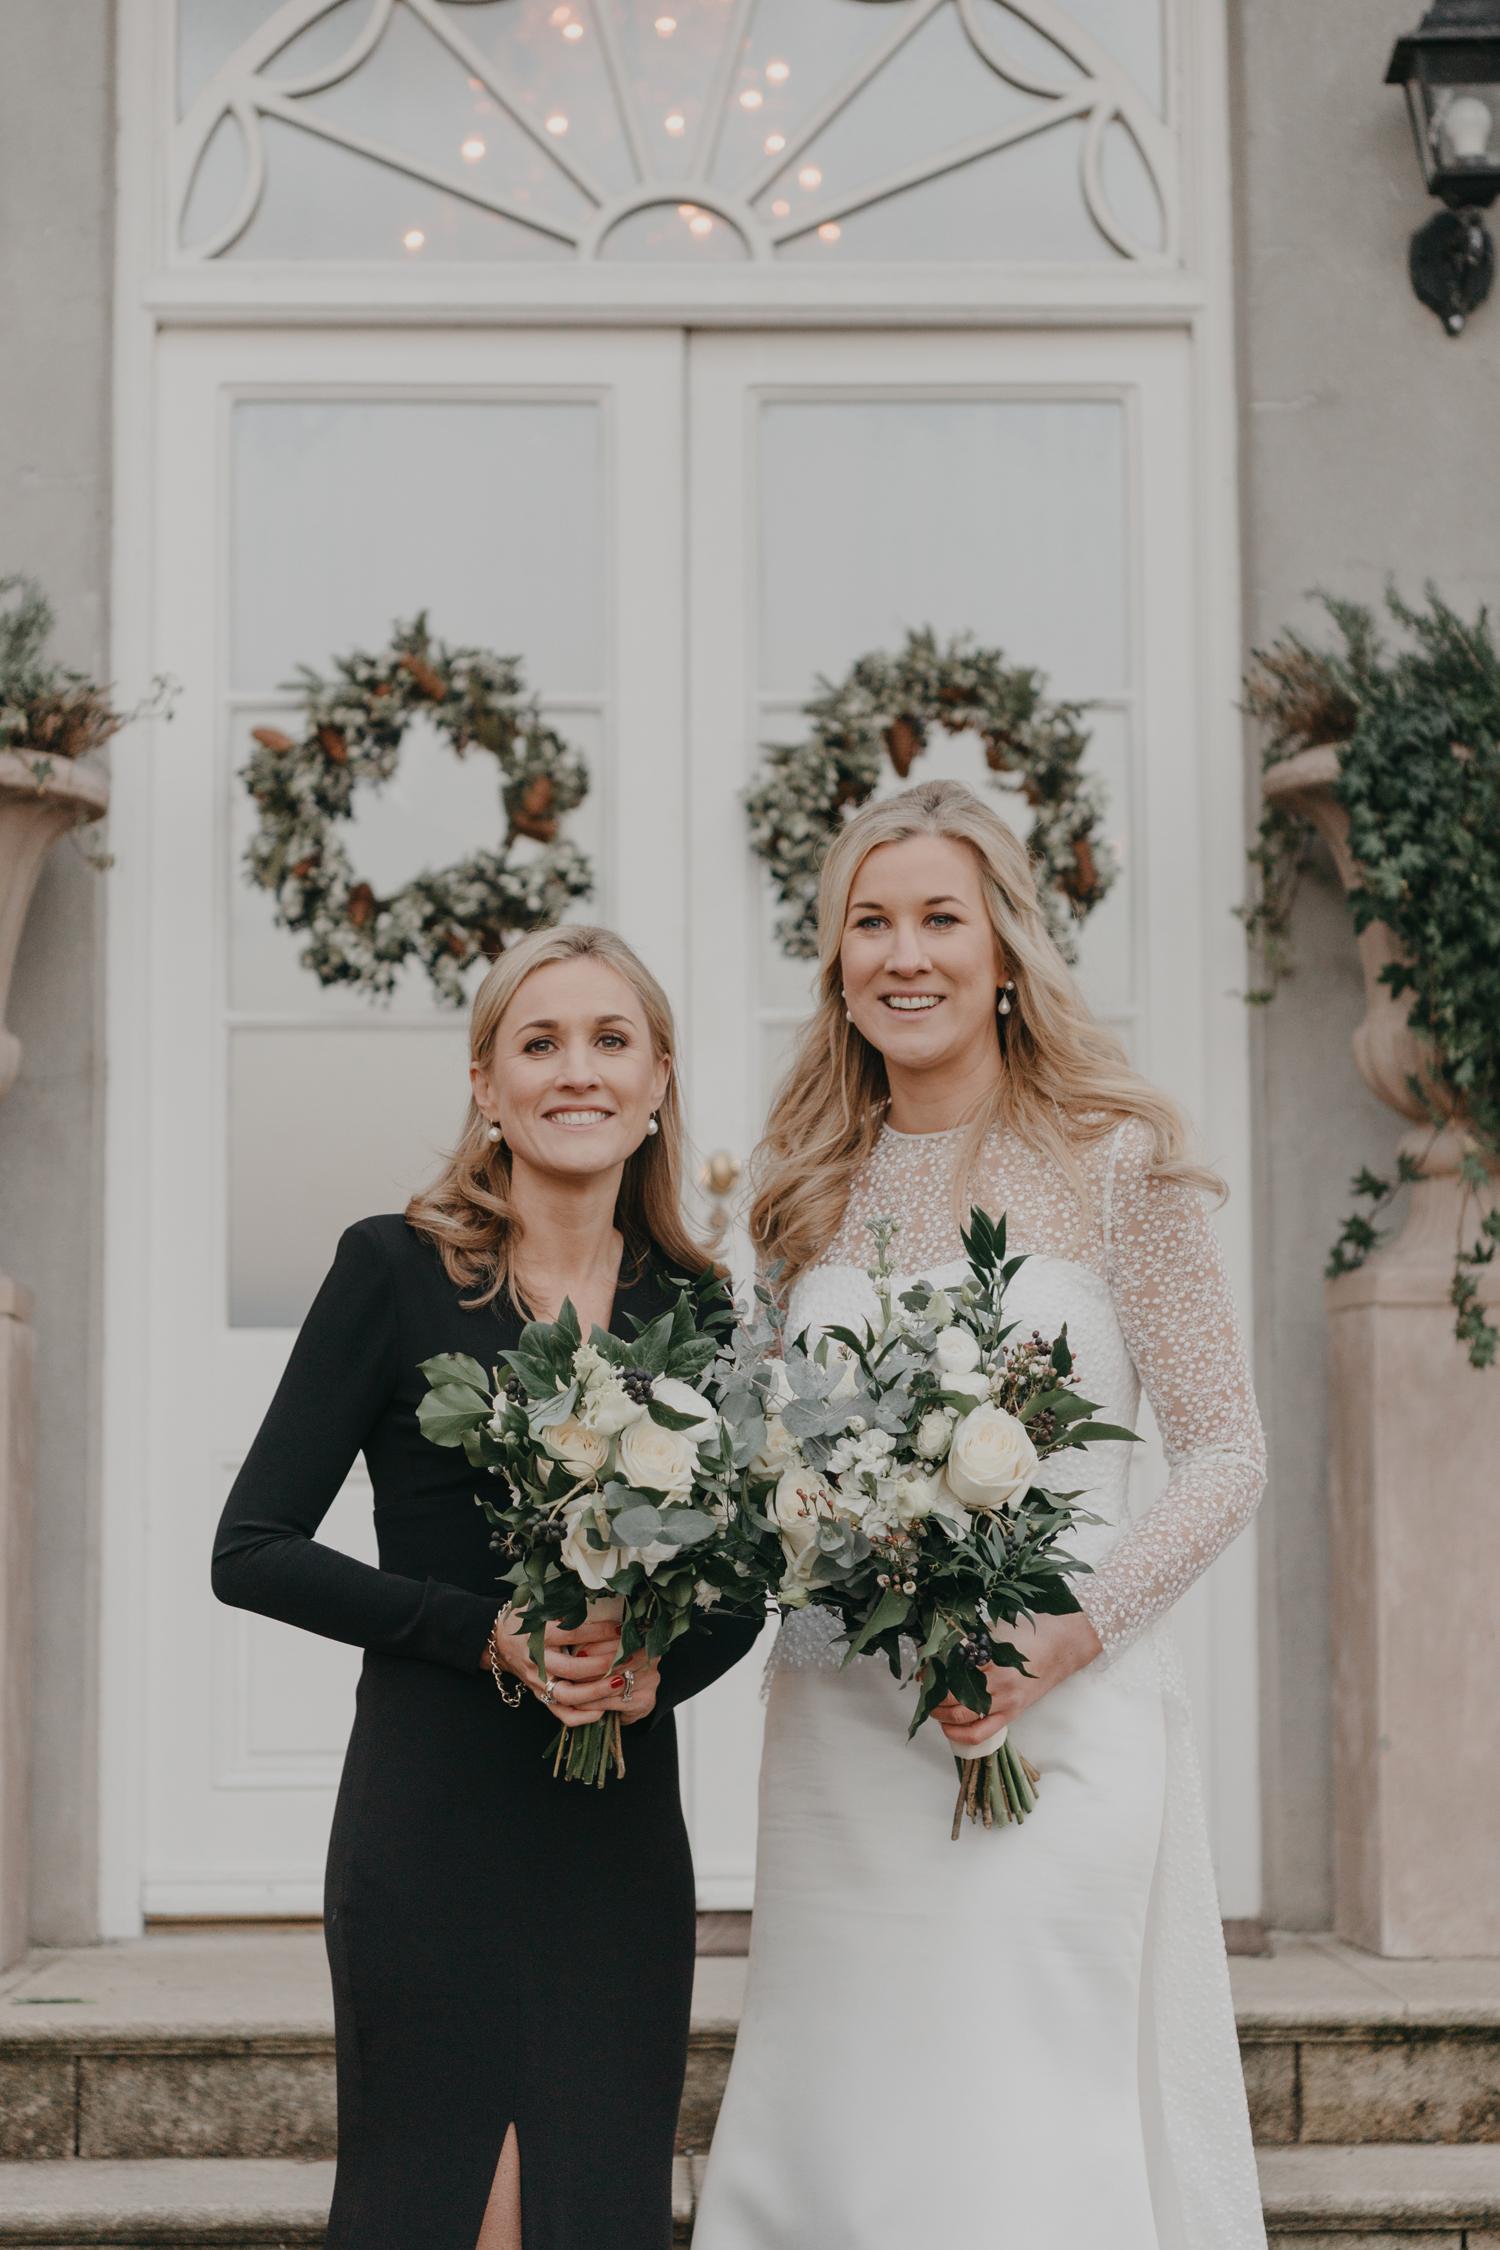 clonwilliam-house-wedding-photographer-138.jpg